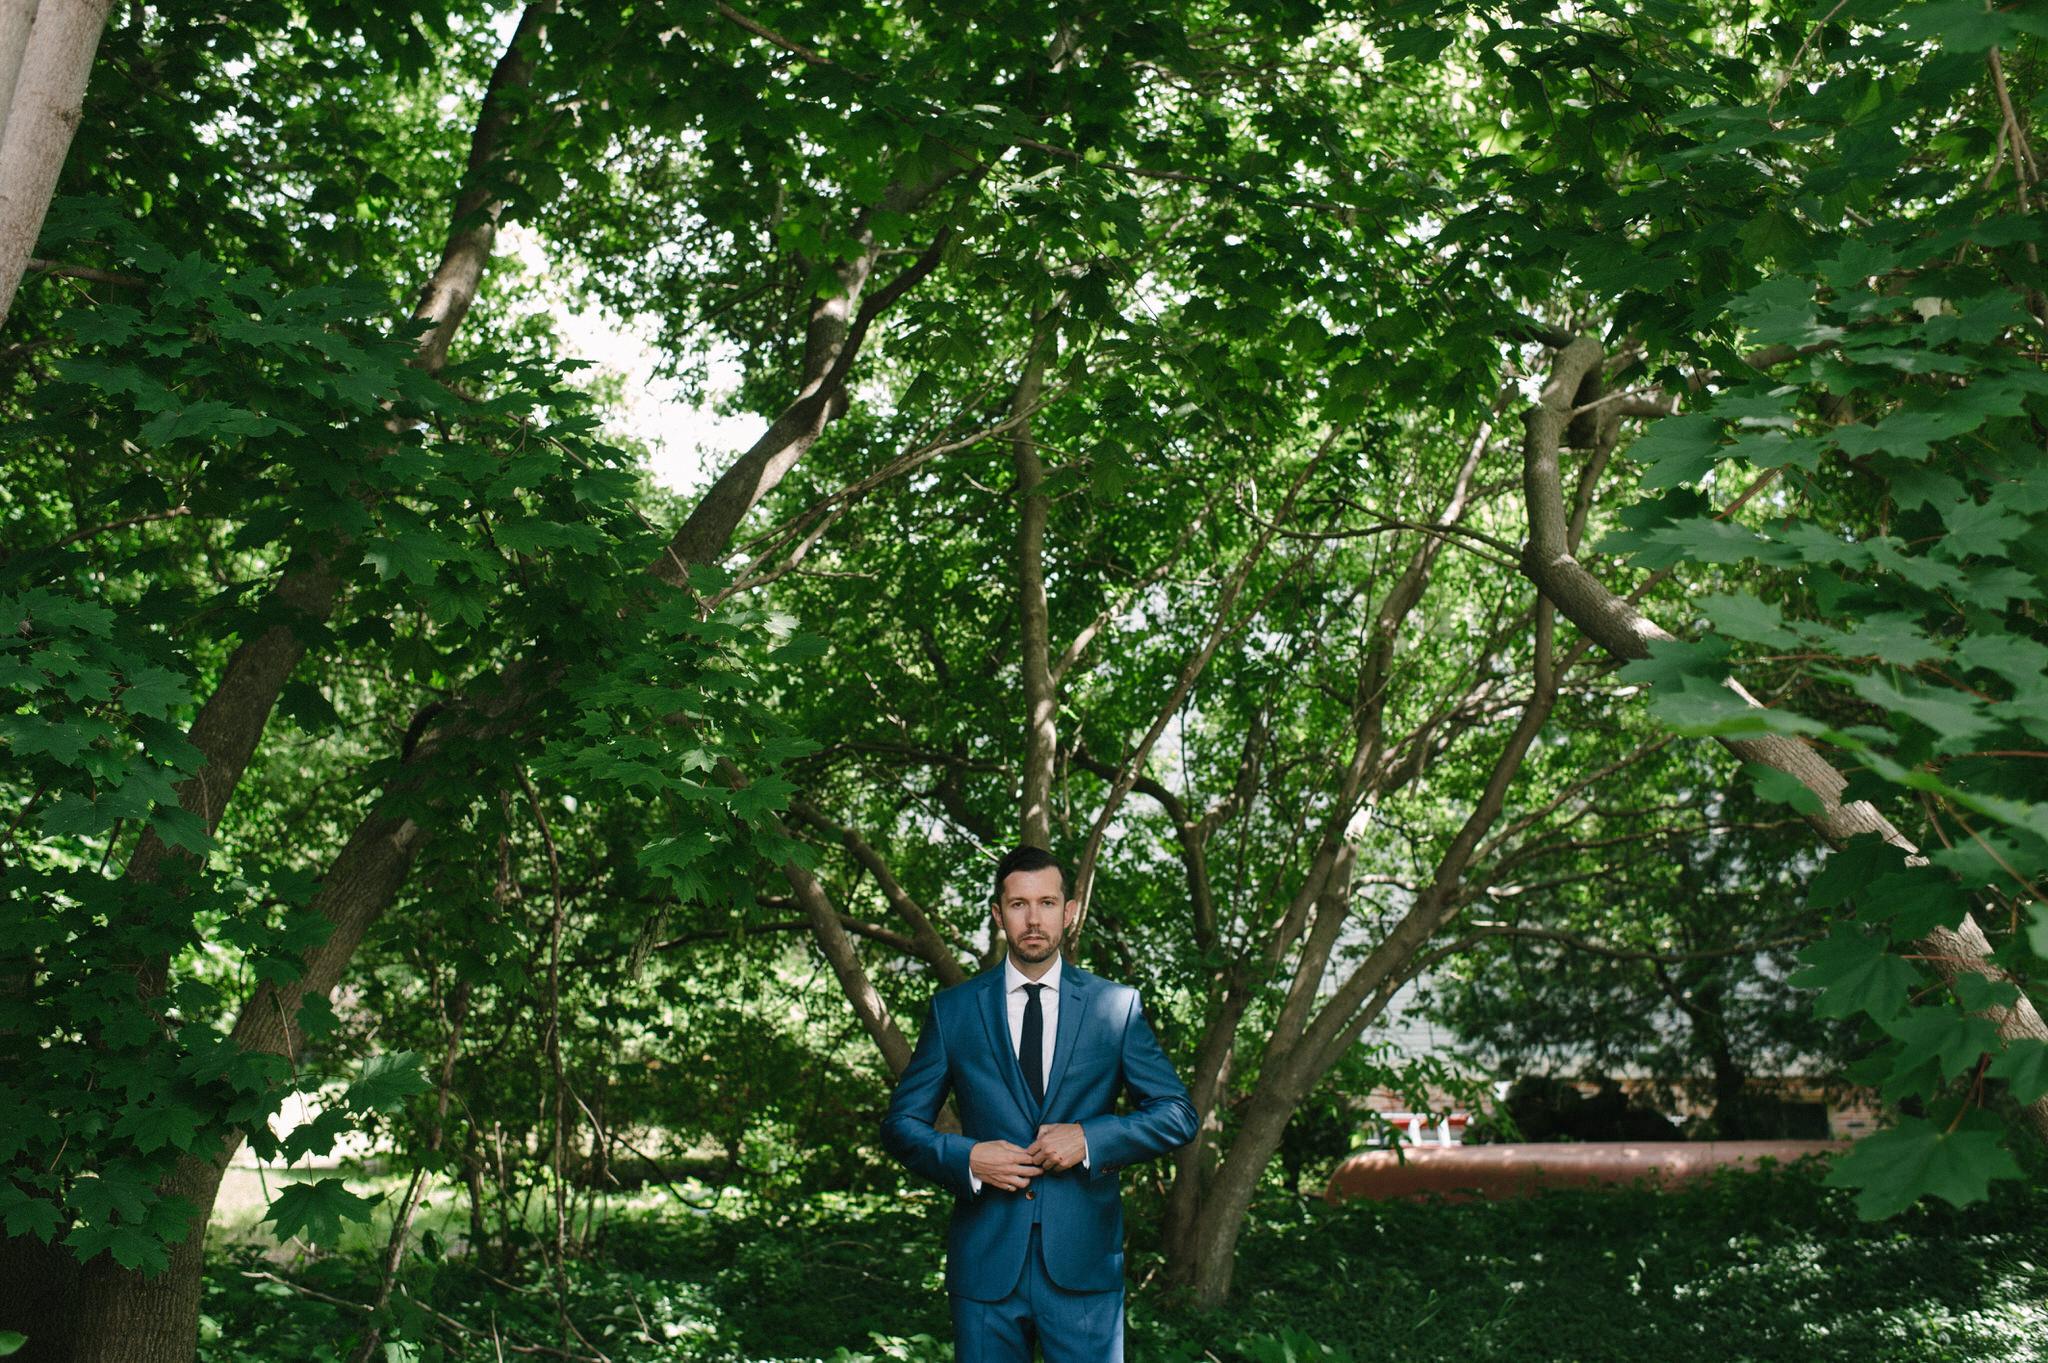 toronto wedding photography scarlet oneill069.JPG